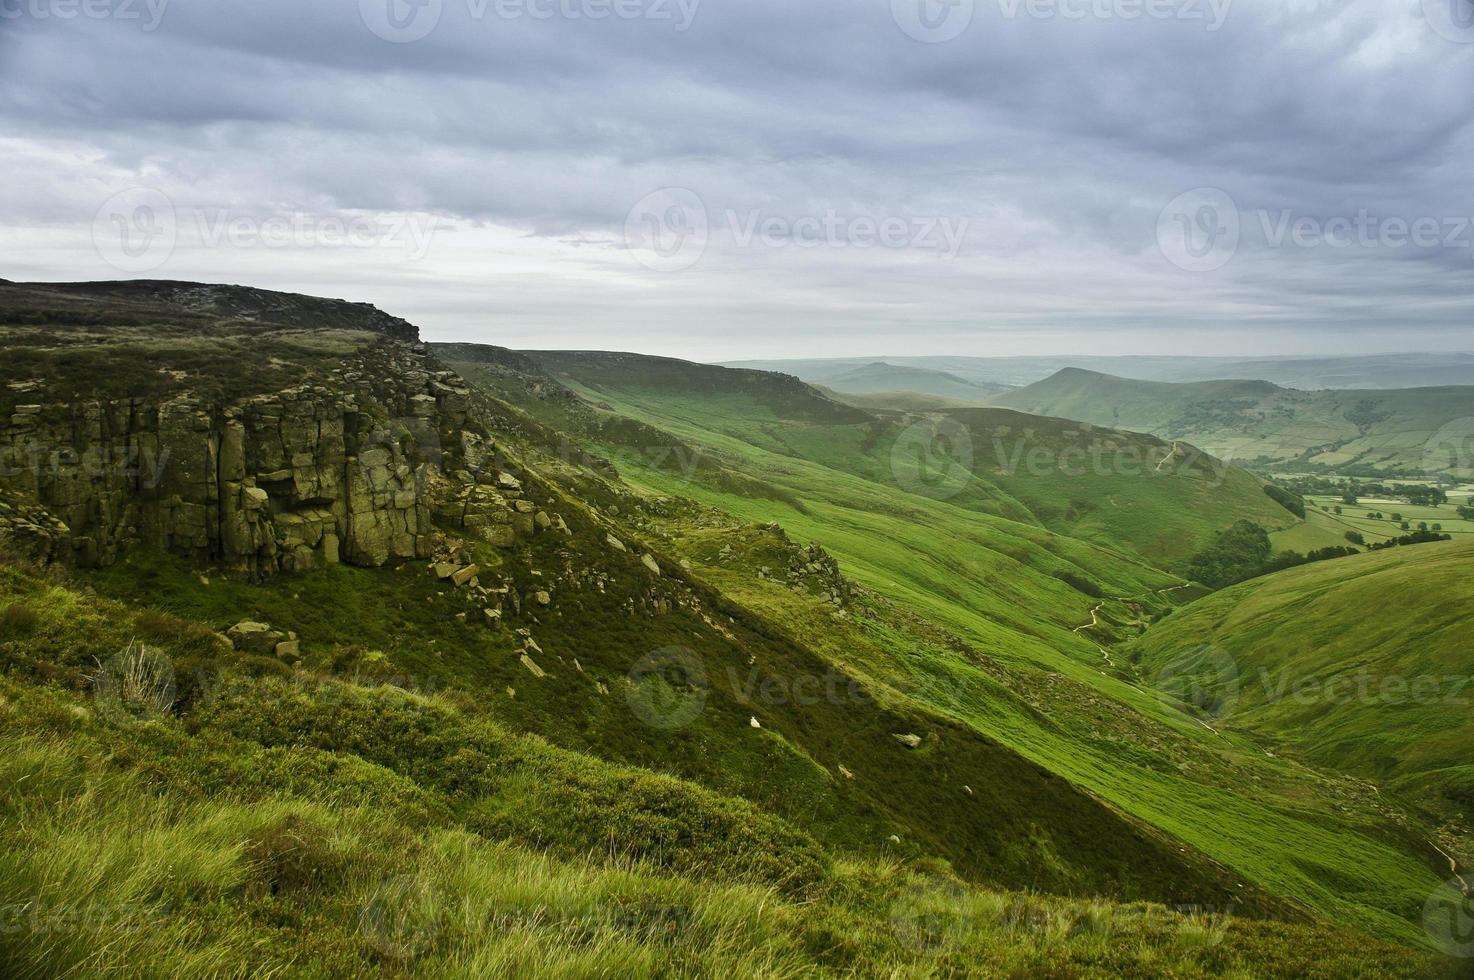 vackert landskap av peak district nationalpark i Storbritannien foto